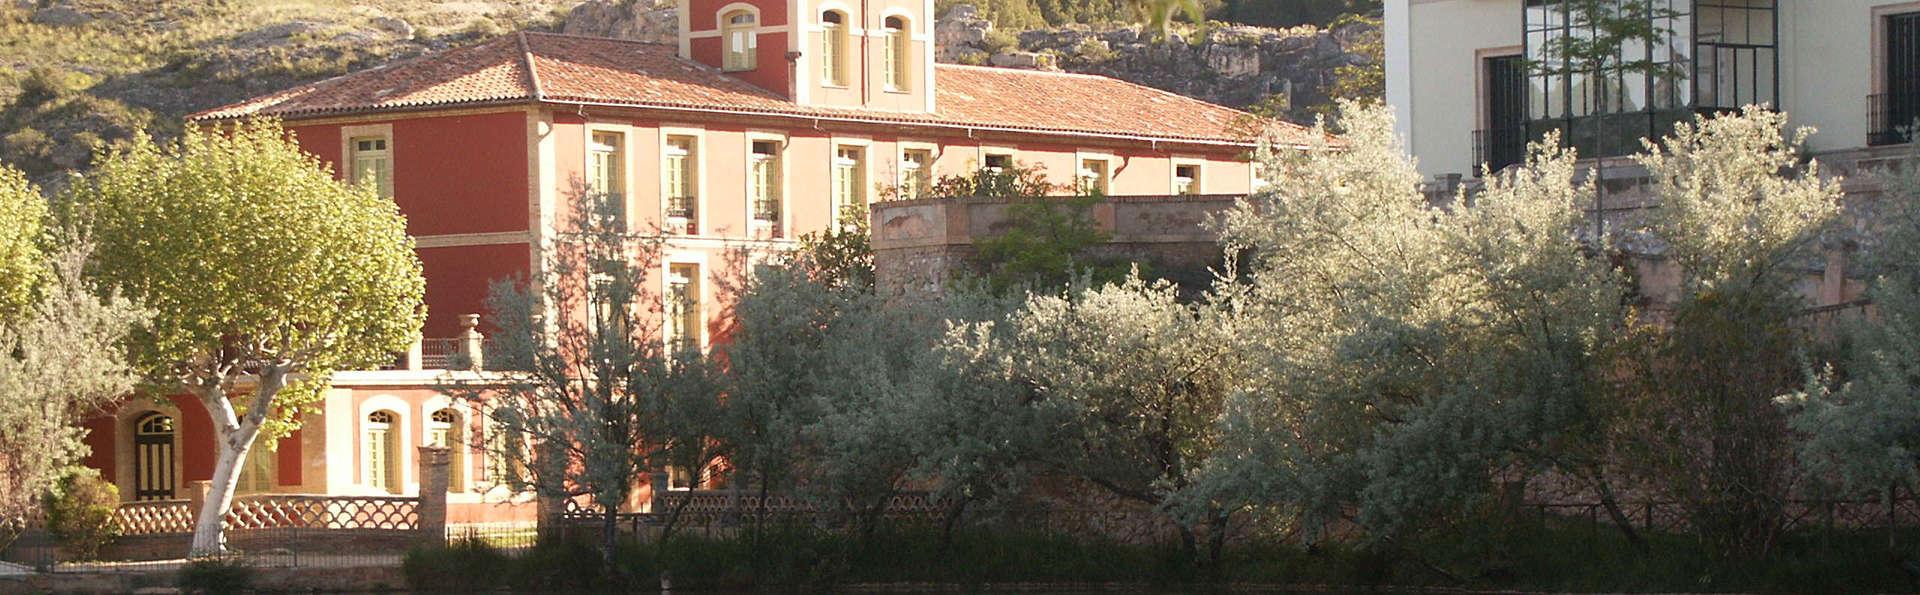 Balneario Termas Pallares - Hotel Parque - edit_facade.jpg